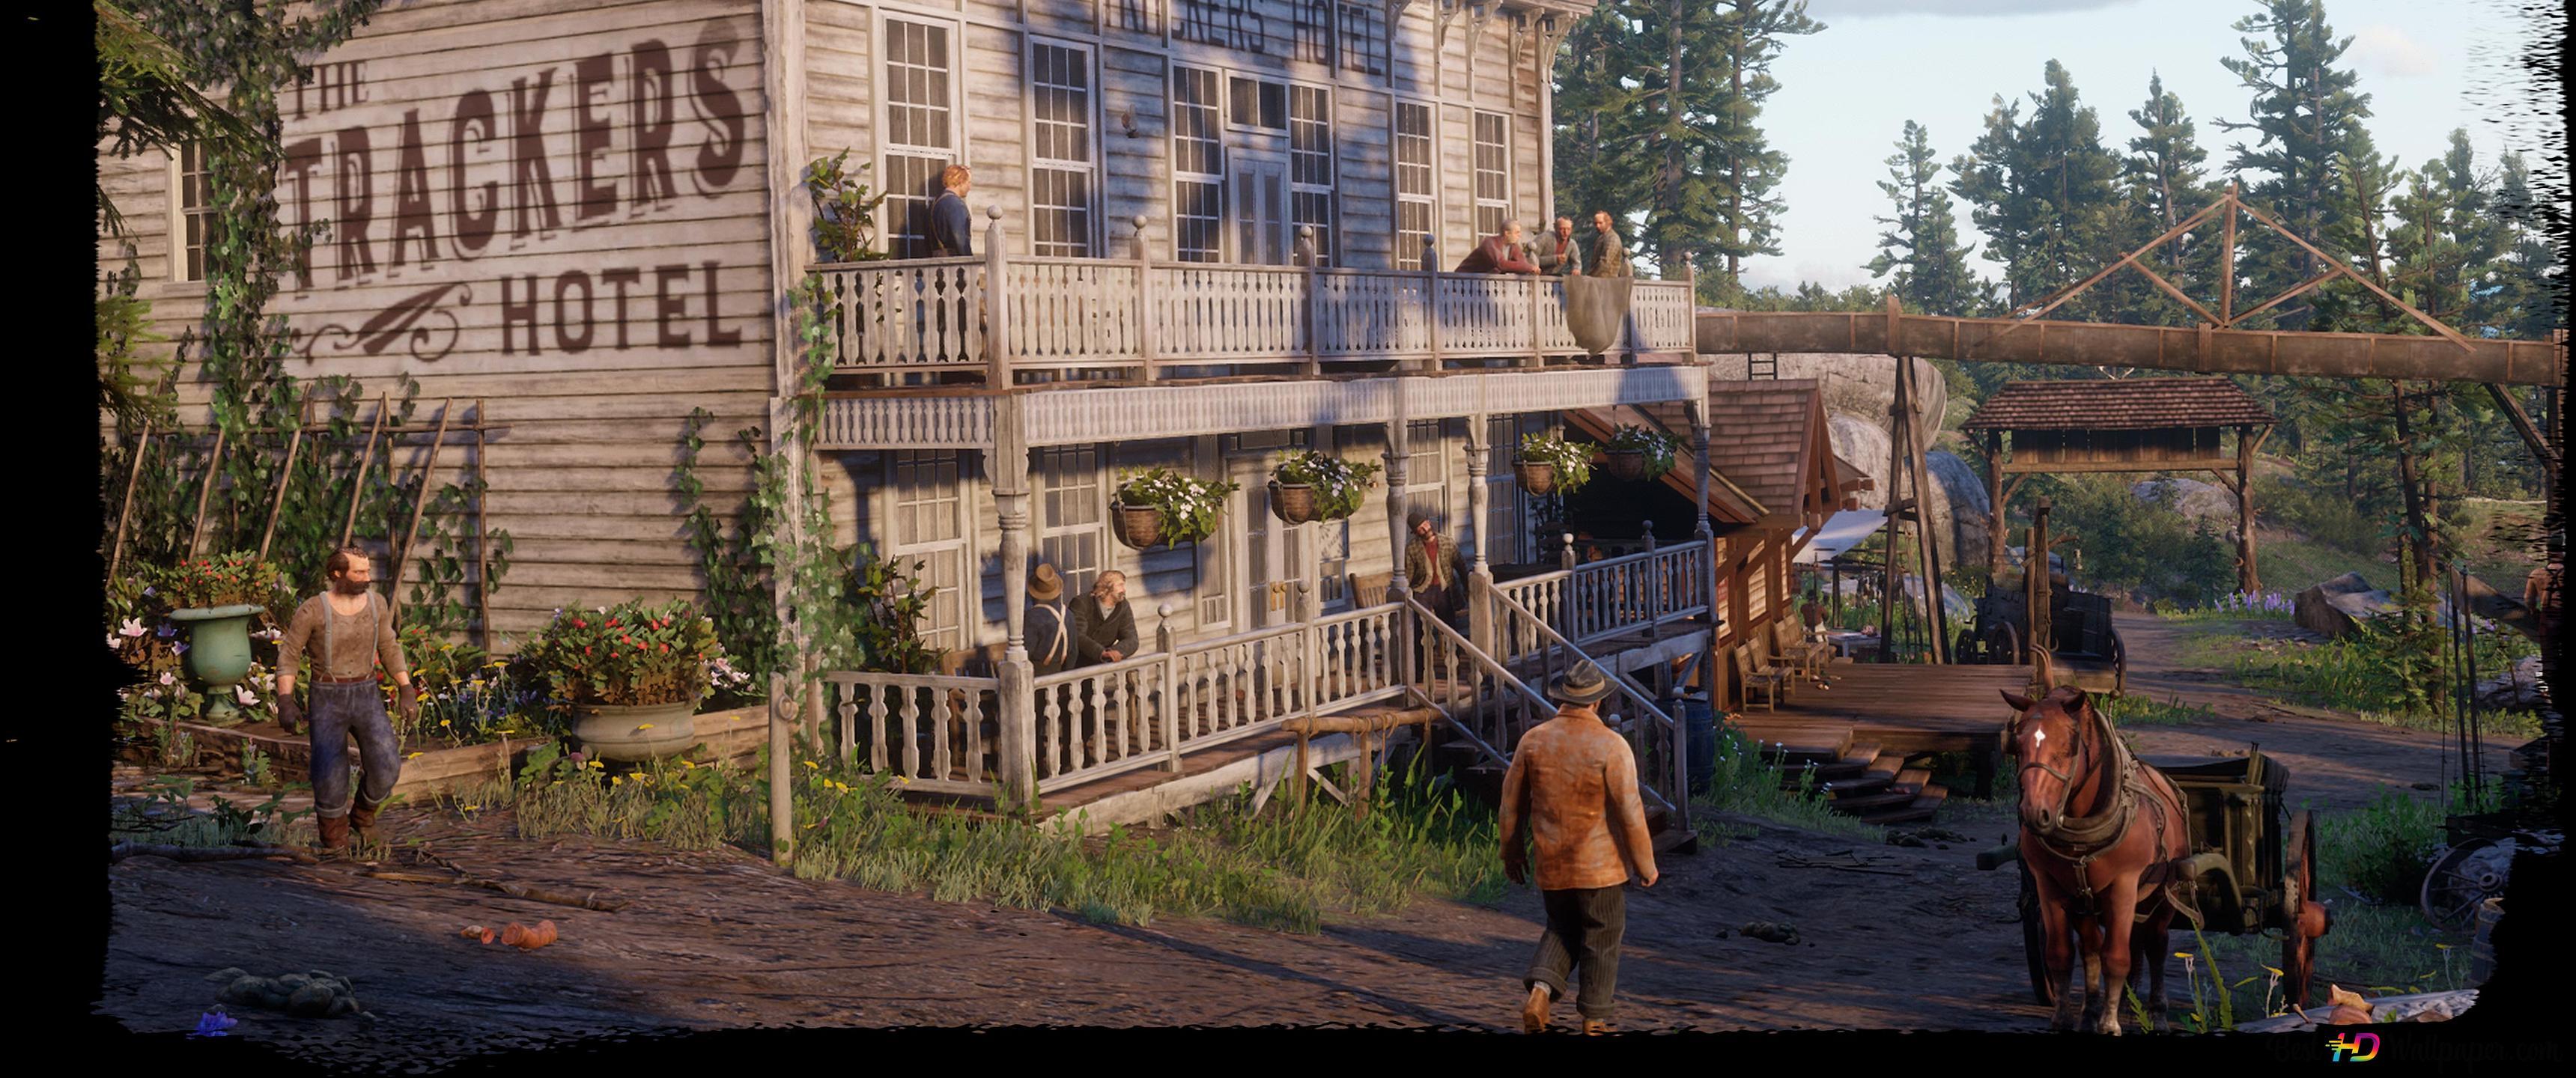 Trackers Hotel De Red Dead Redemption Hd Wallpaper Download